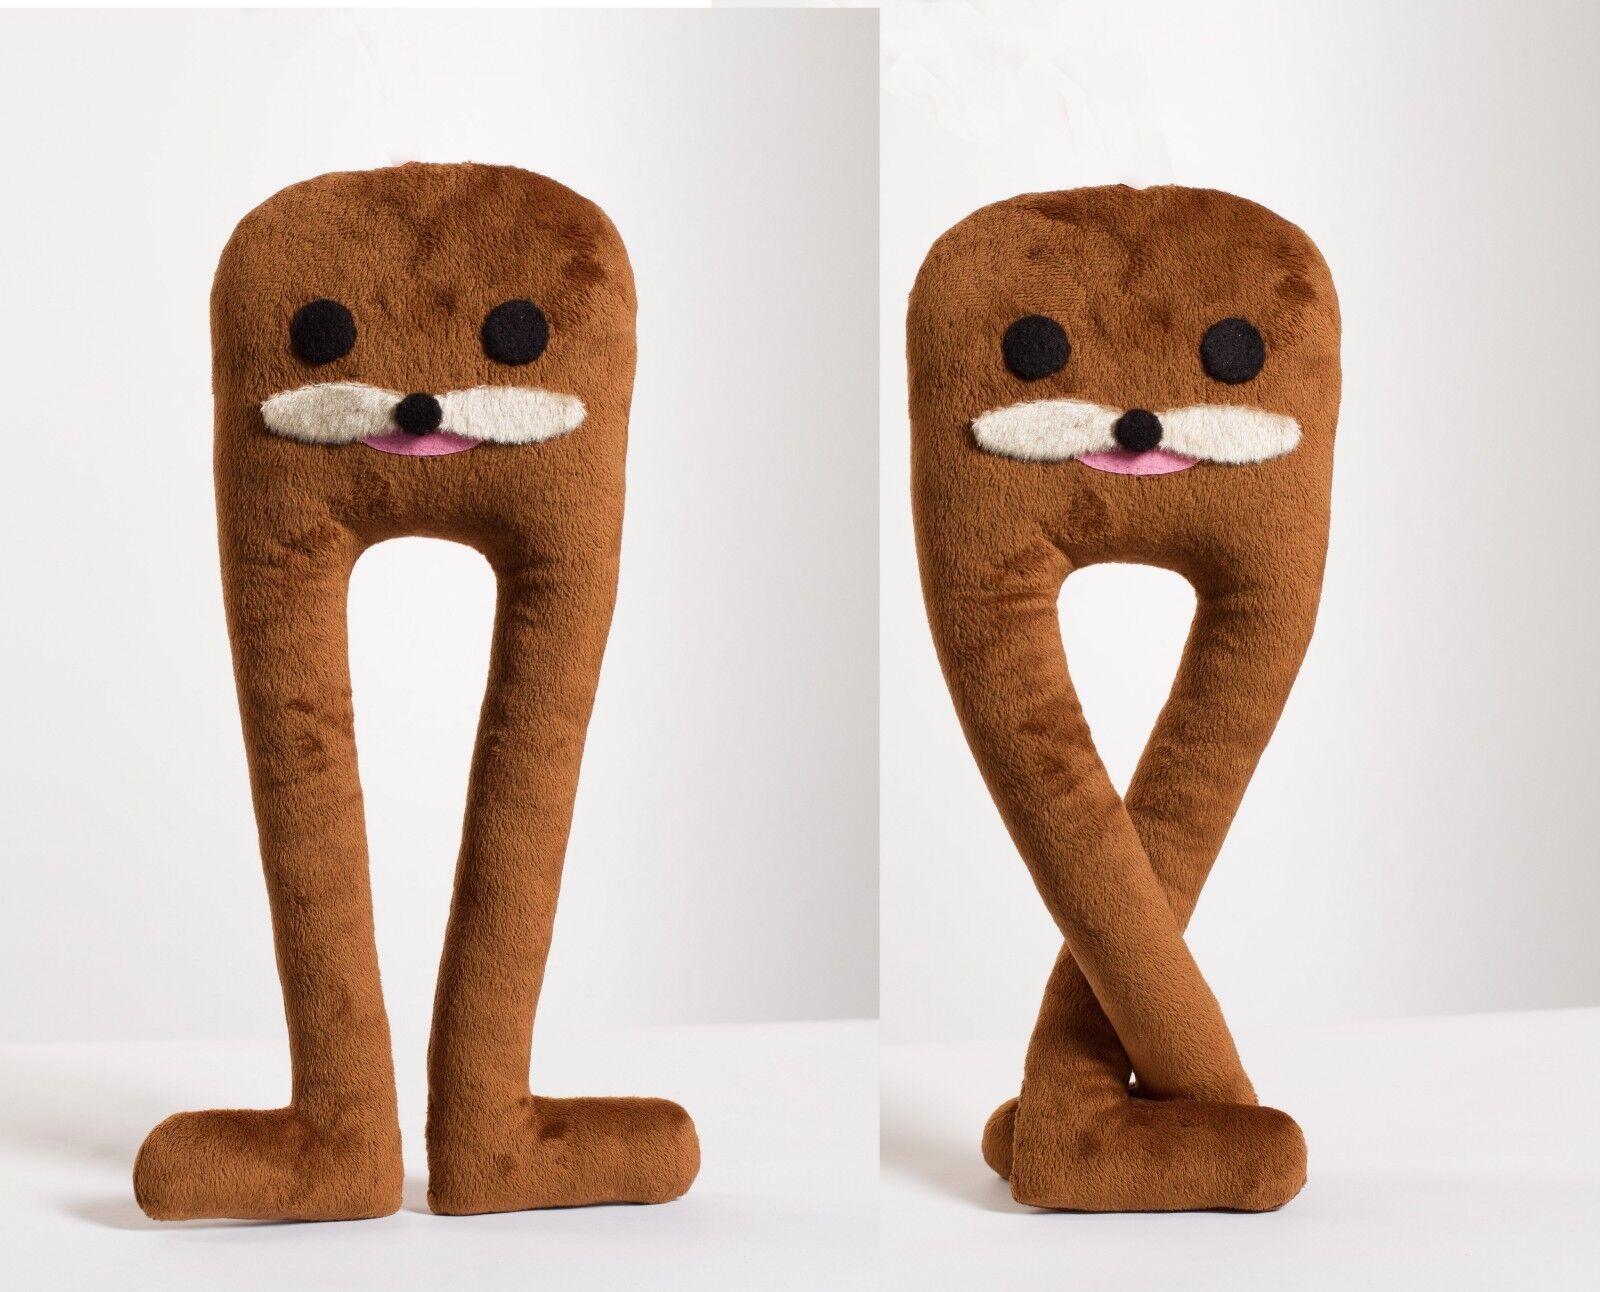 Gondola meme plush toy, 15 in, handmade cuddly gondola meme plushie